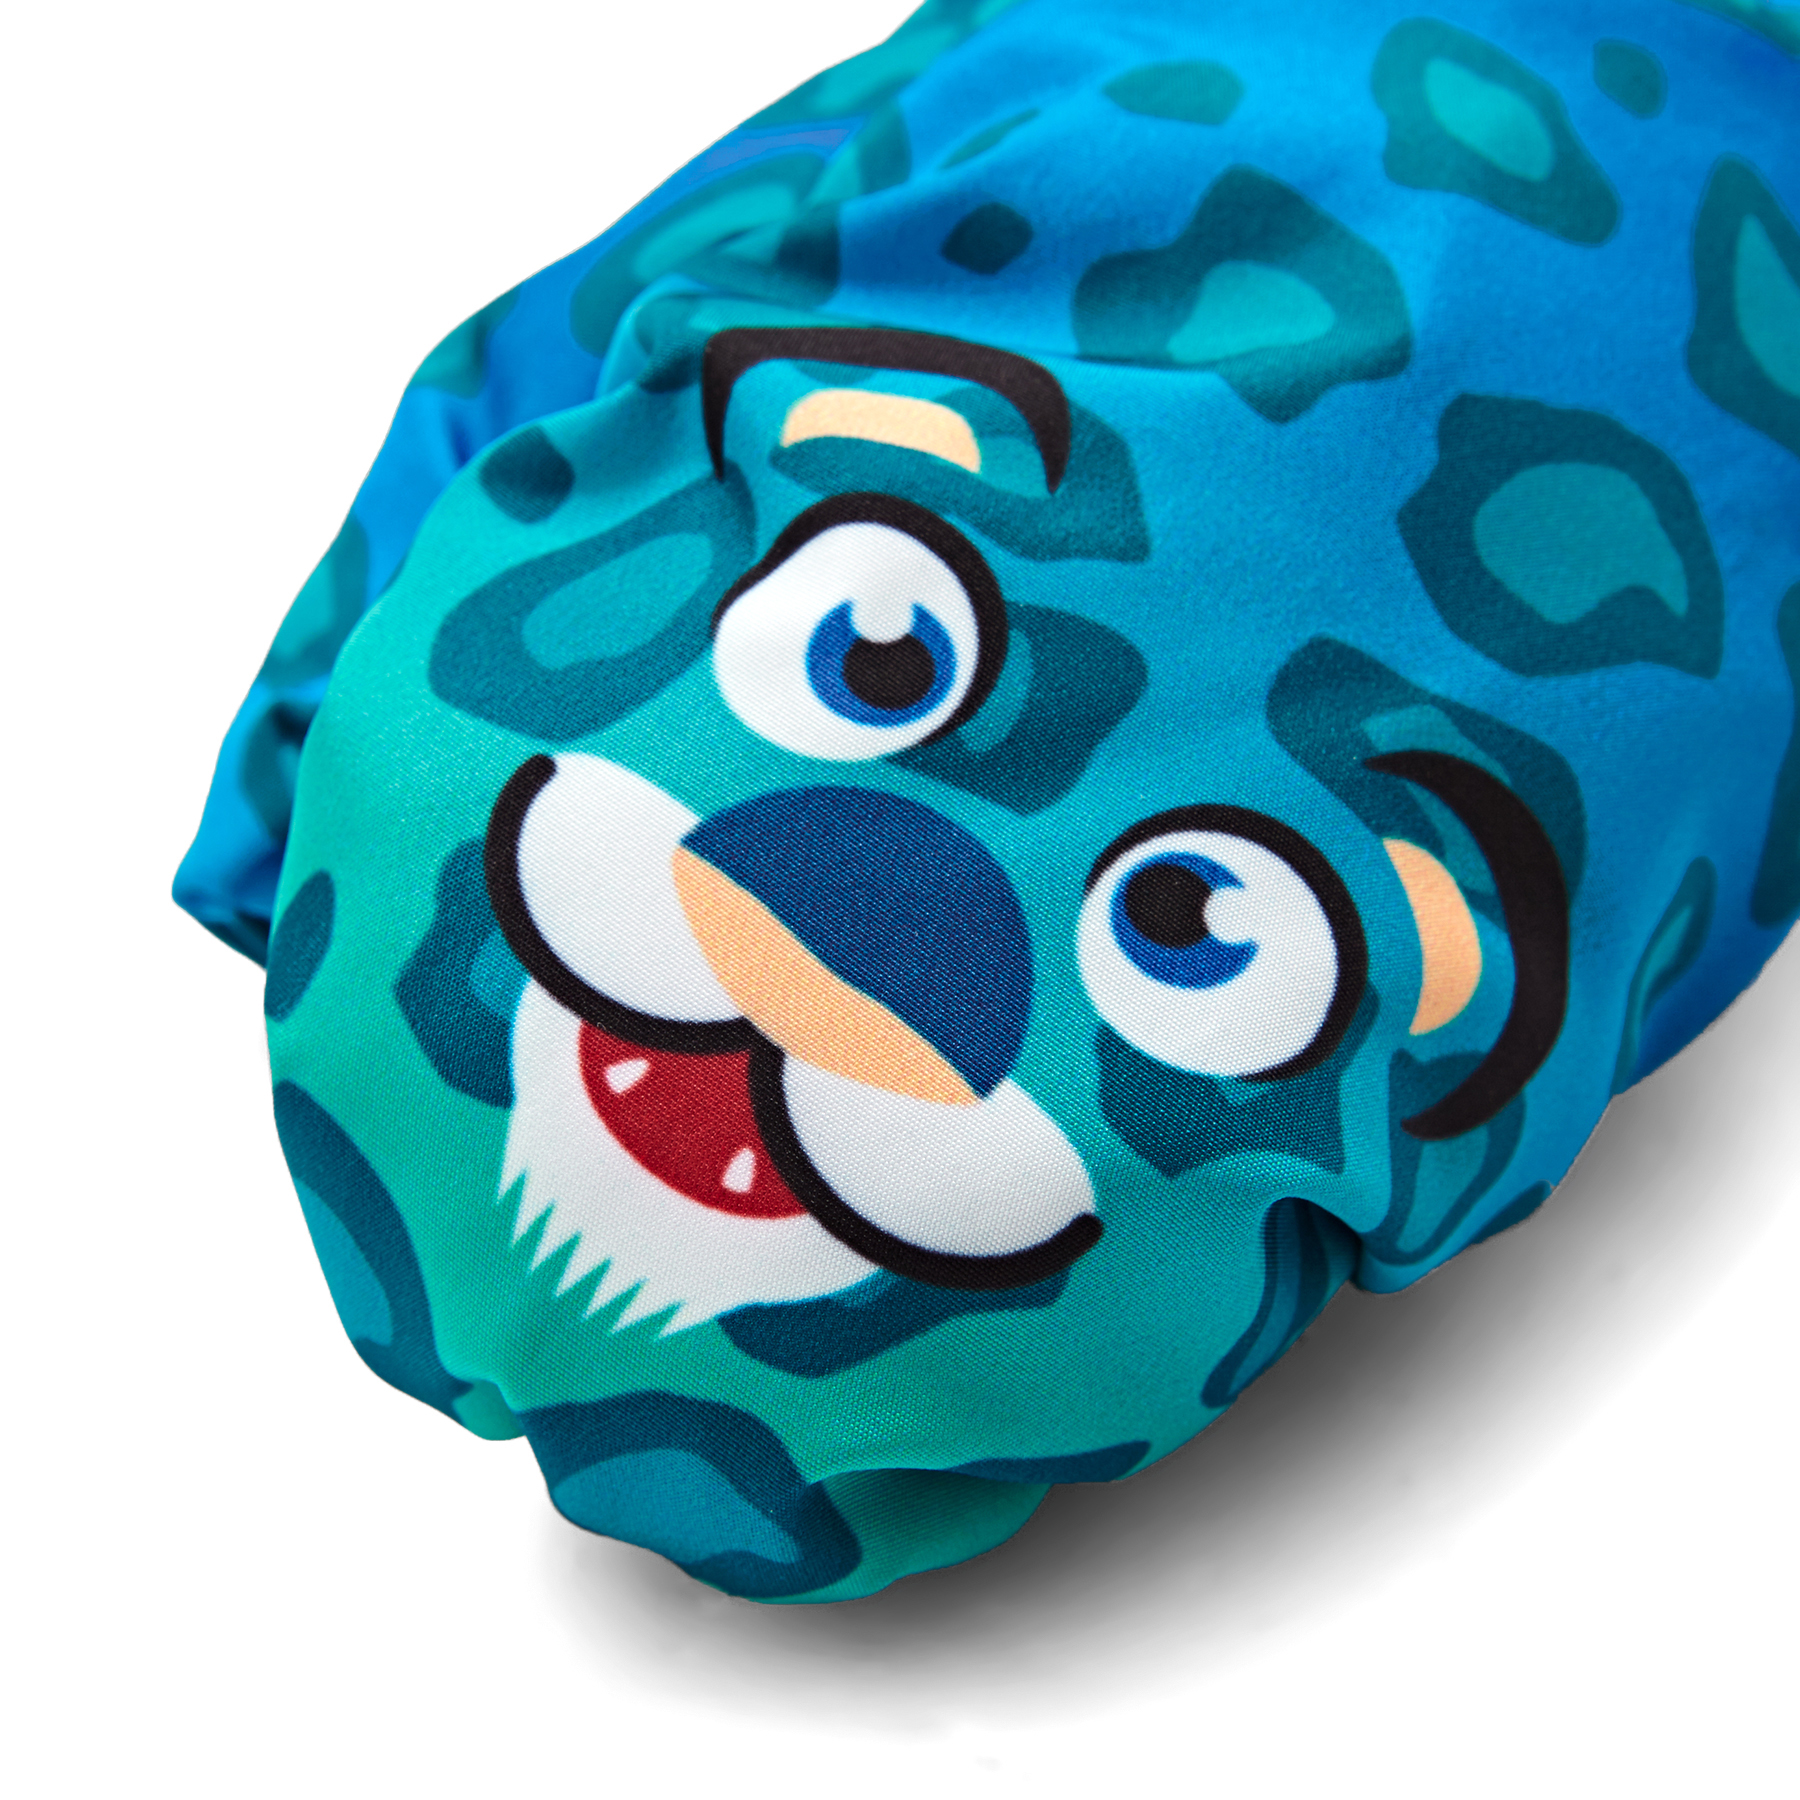 Barts Children/'s Gloves Mittens Water-Resistant Nylon Mitts Leopard Blue New